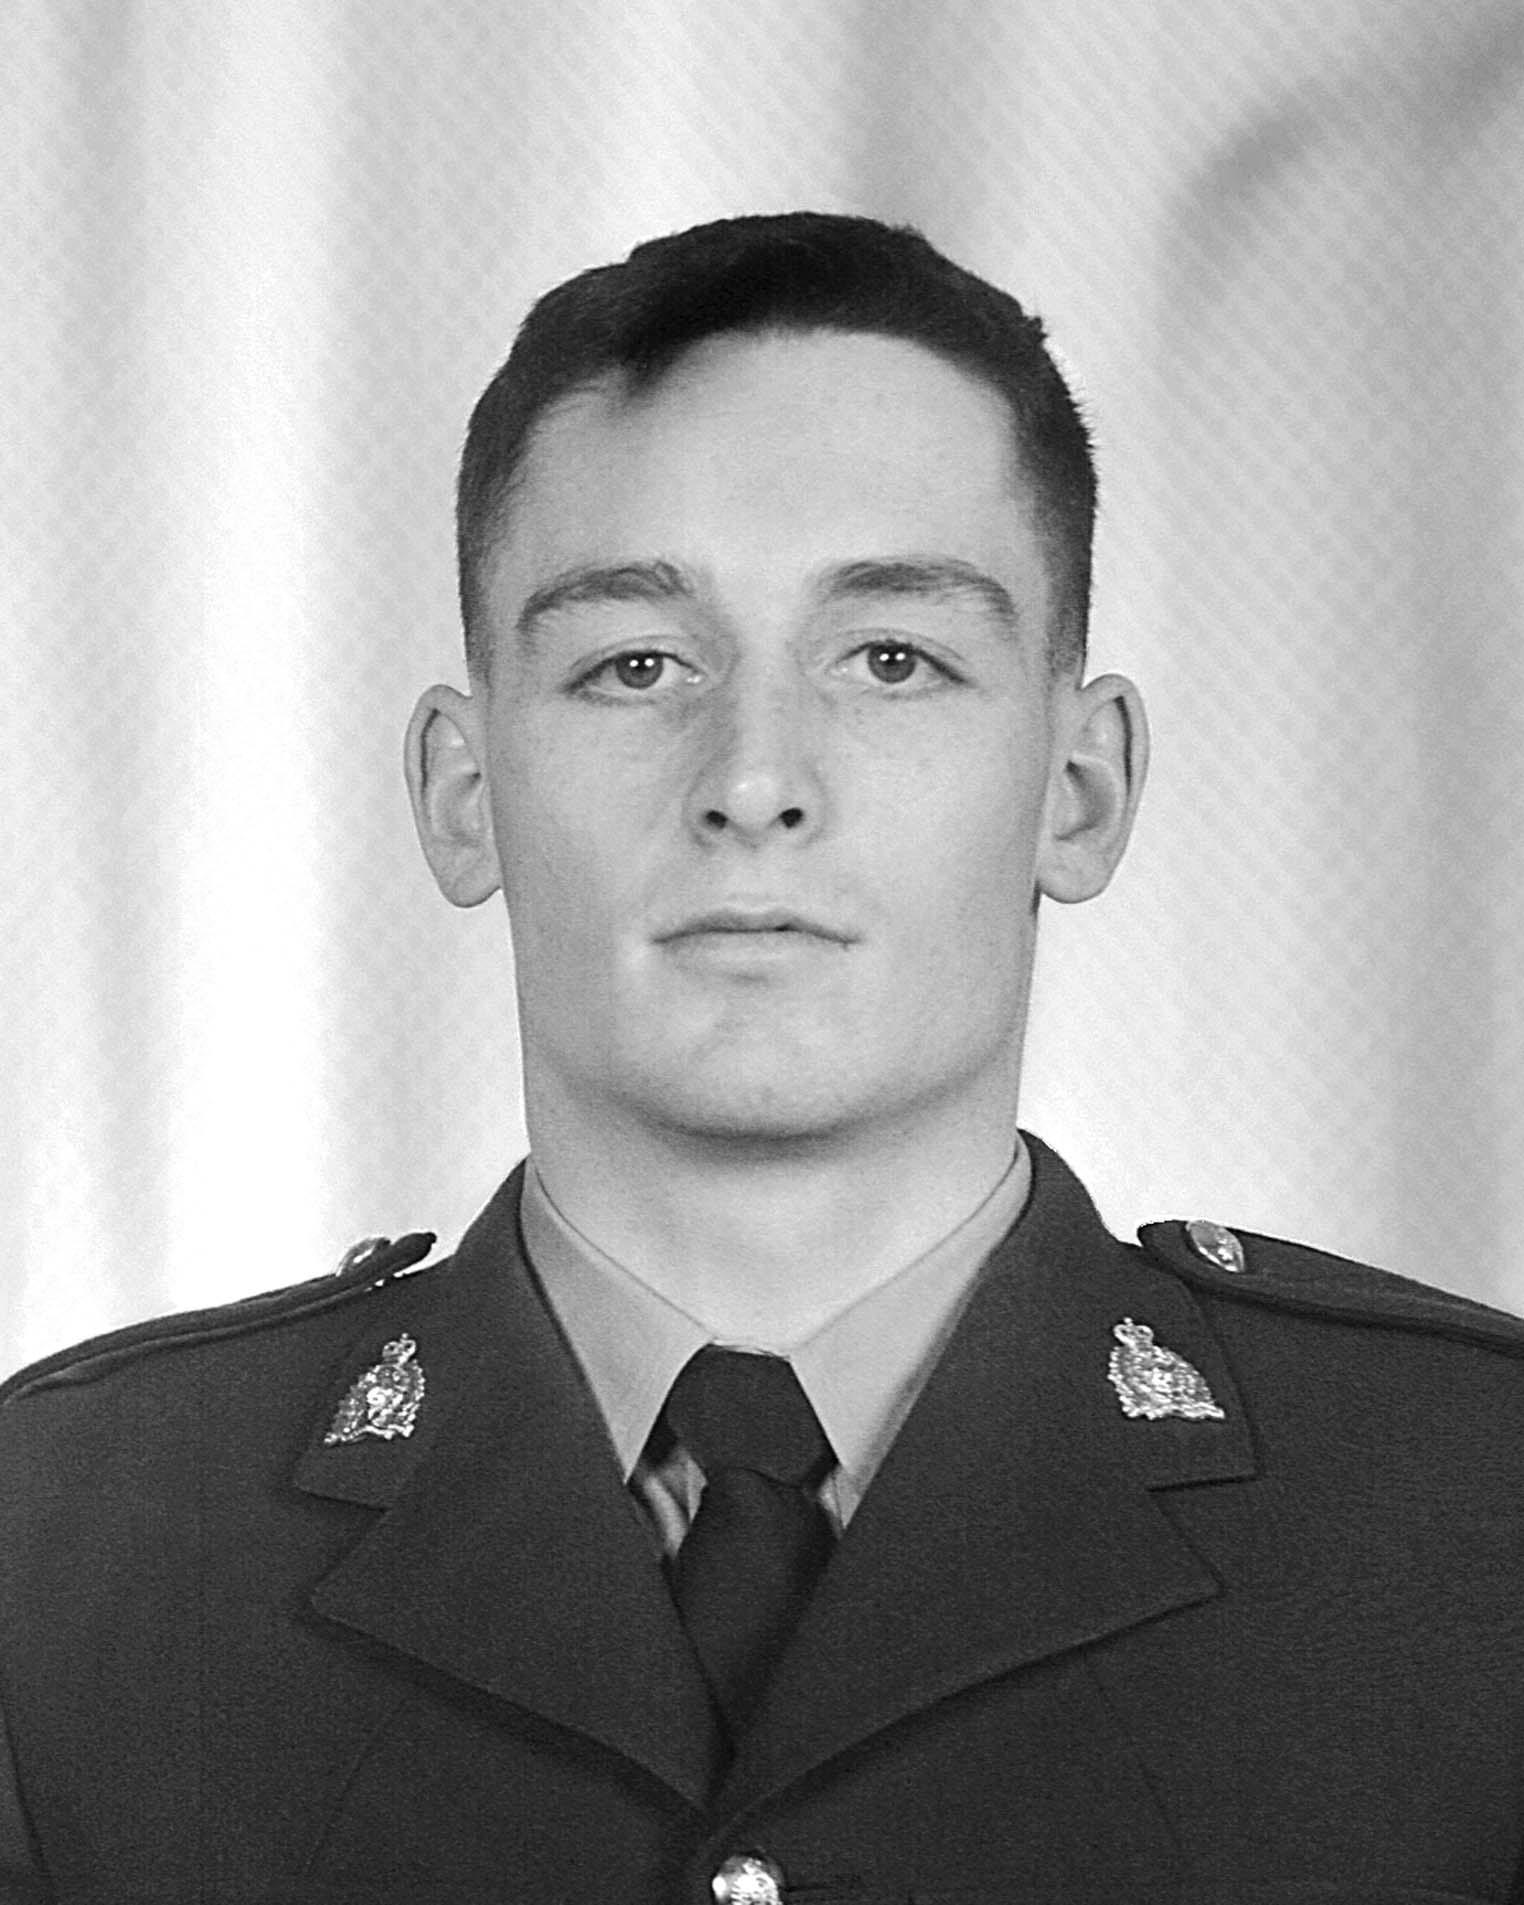 Second Class Constable George Herbert Edward Ransom